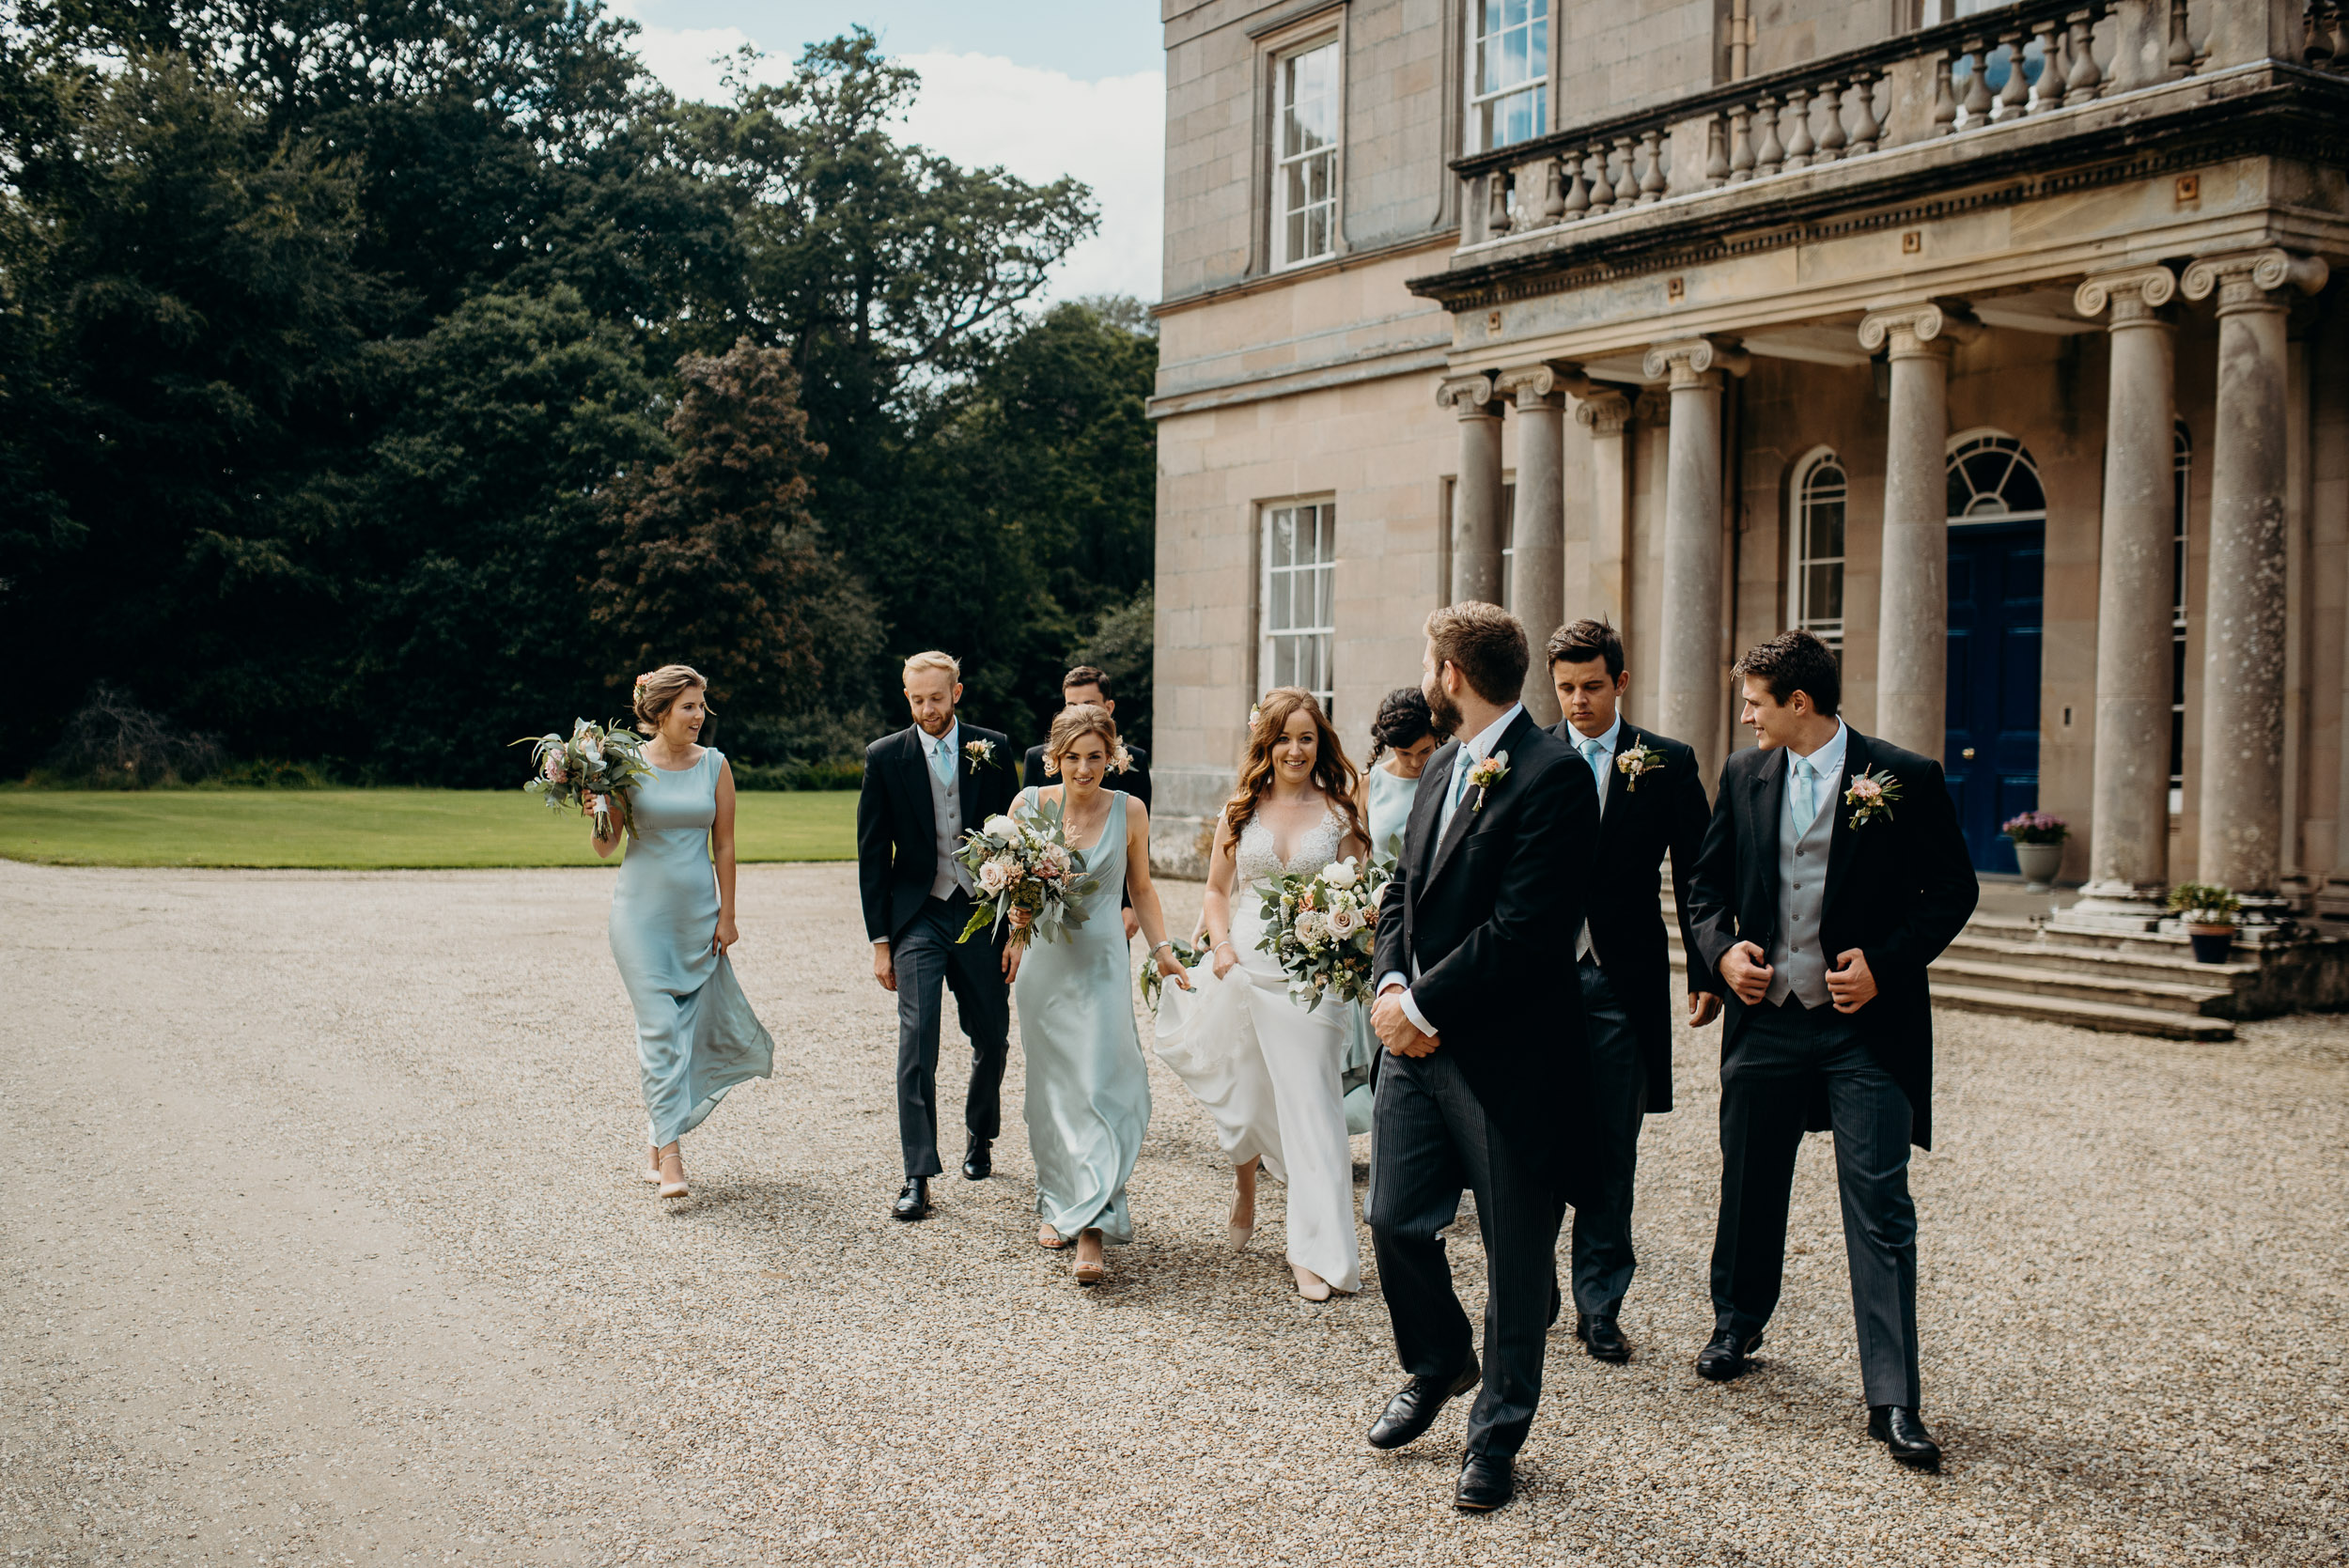 drenagh estate wedding photography-65.jpg